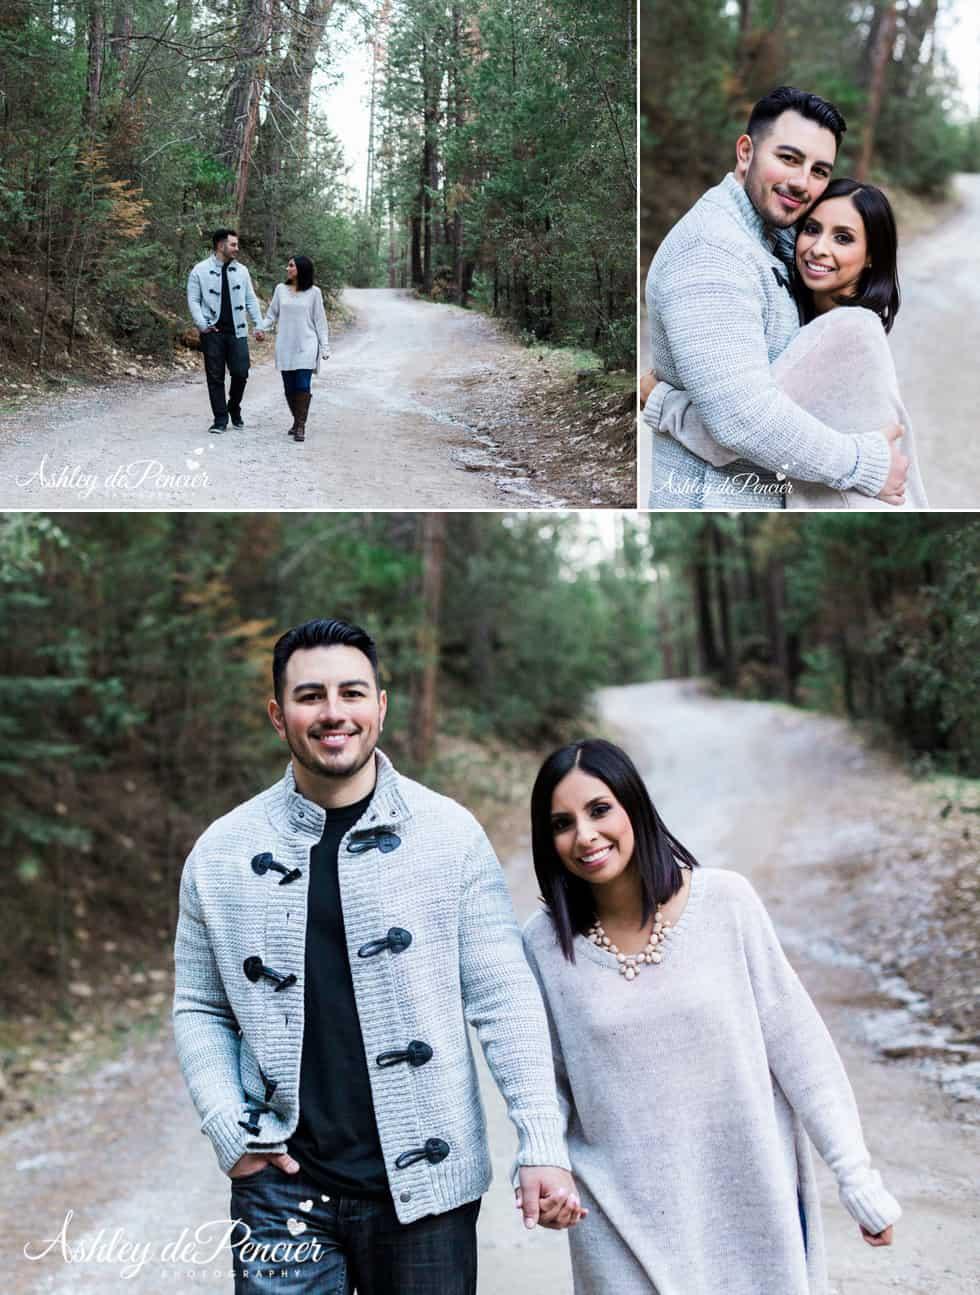 A couple walking down a gravel road